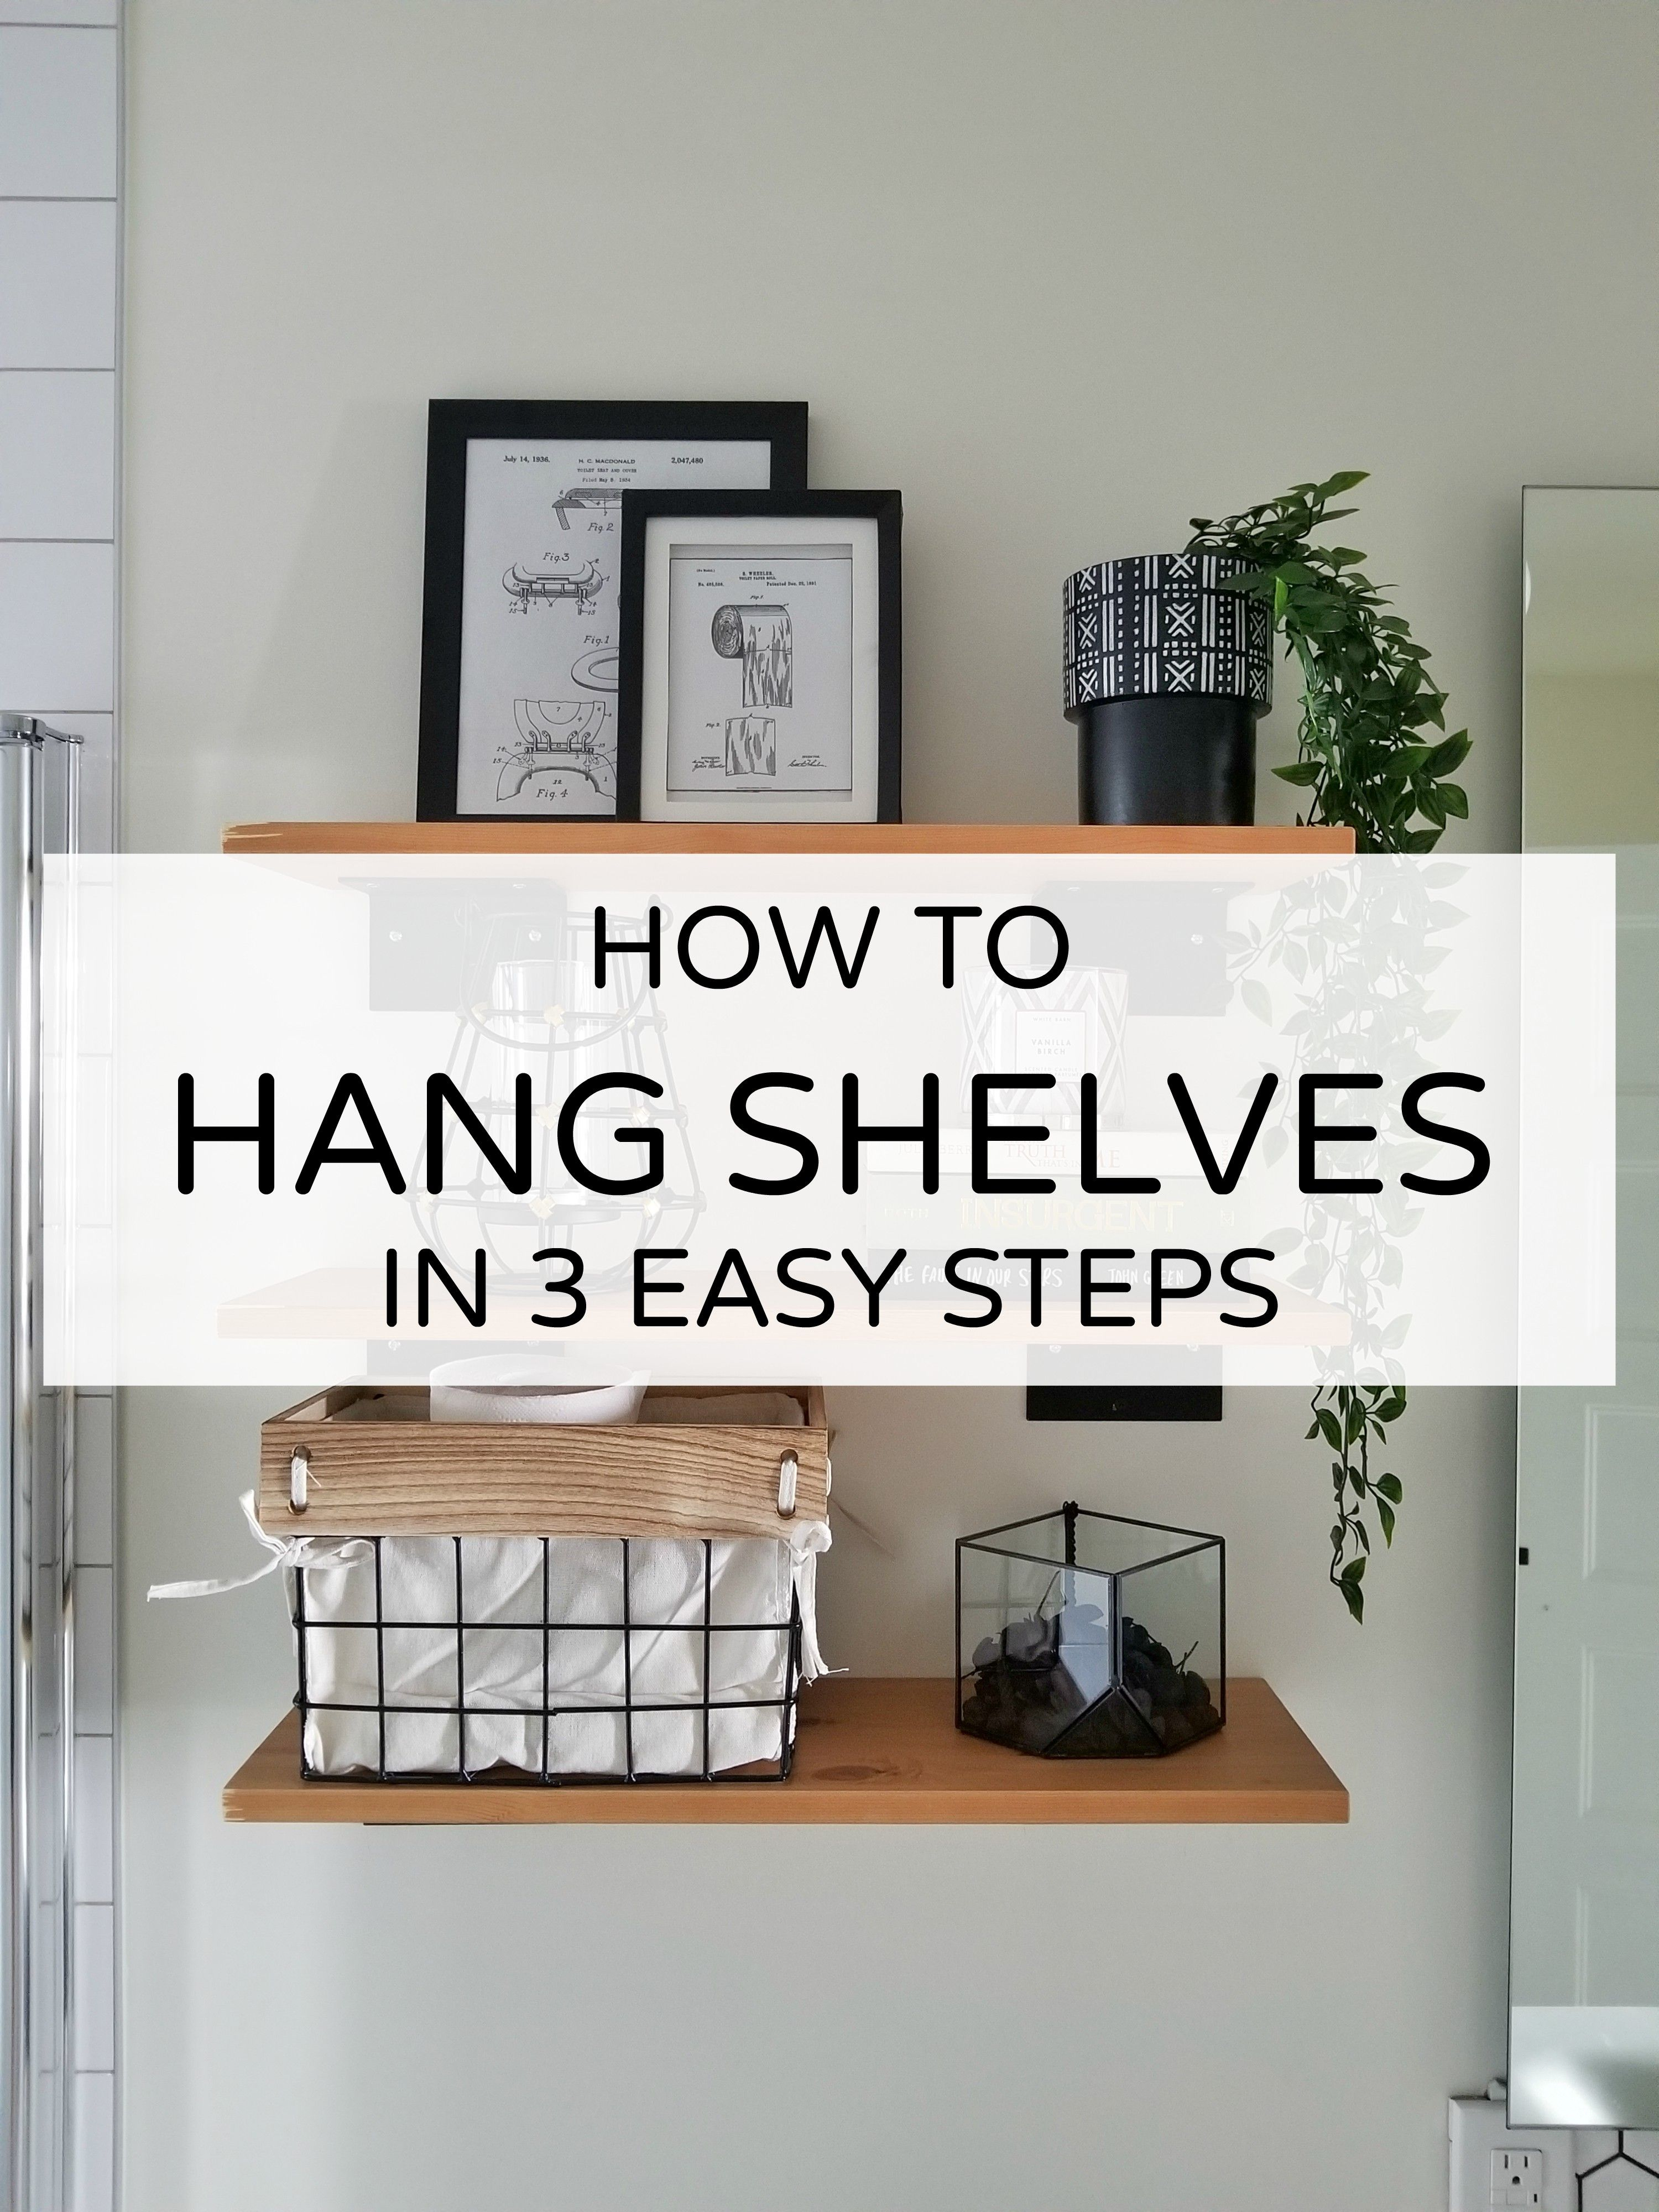 Ikea Wall Shelves How To Hang Shelves In 3 Easy Steps Ikea Wall